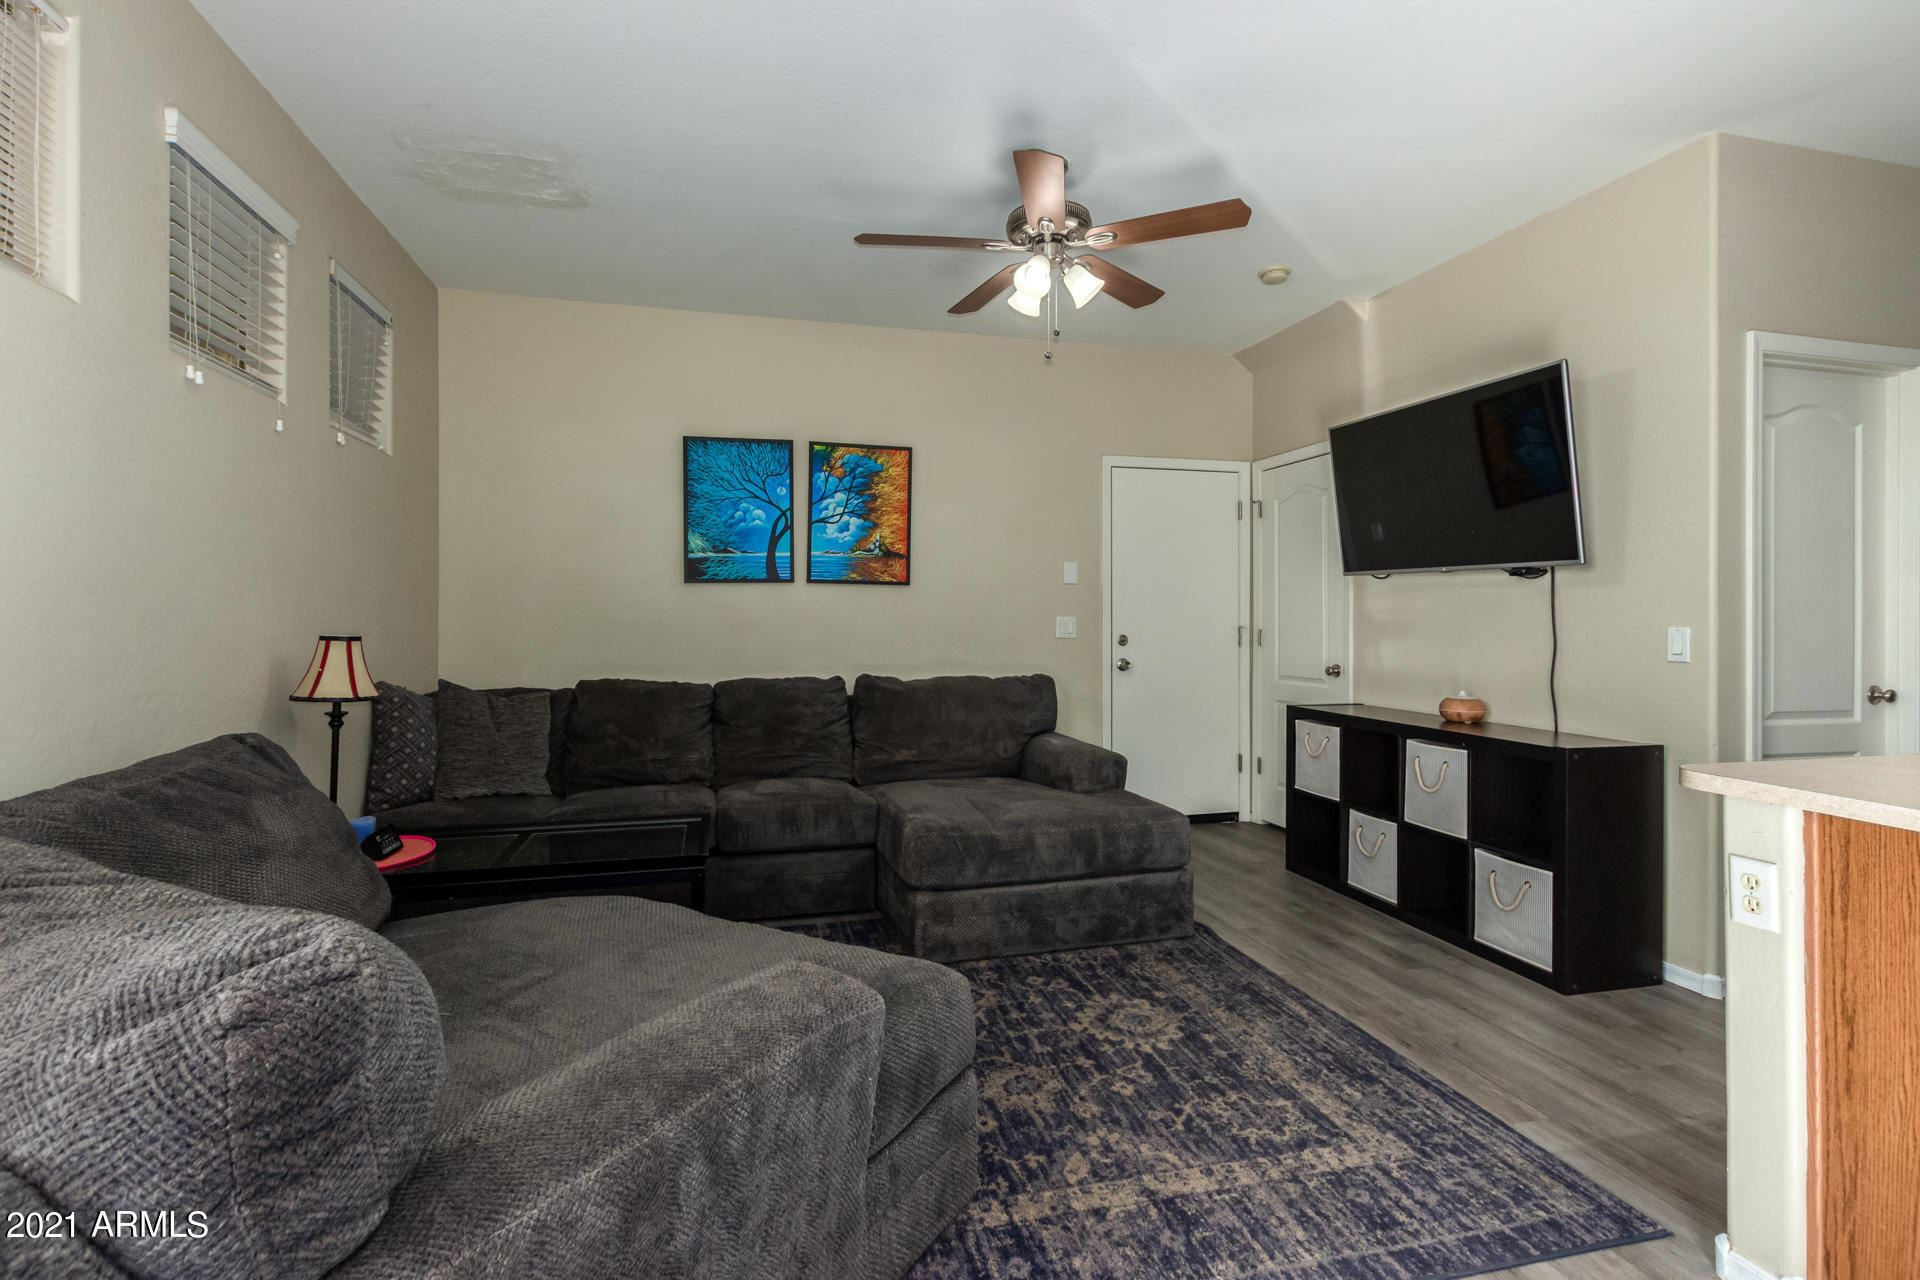 Photo of 2208 N 78TH Glen, Phoenix, AZ 85035 (MLS # 6202673)